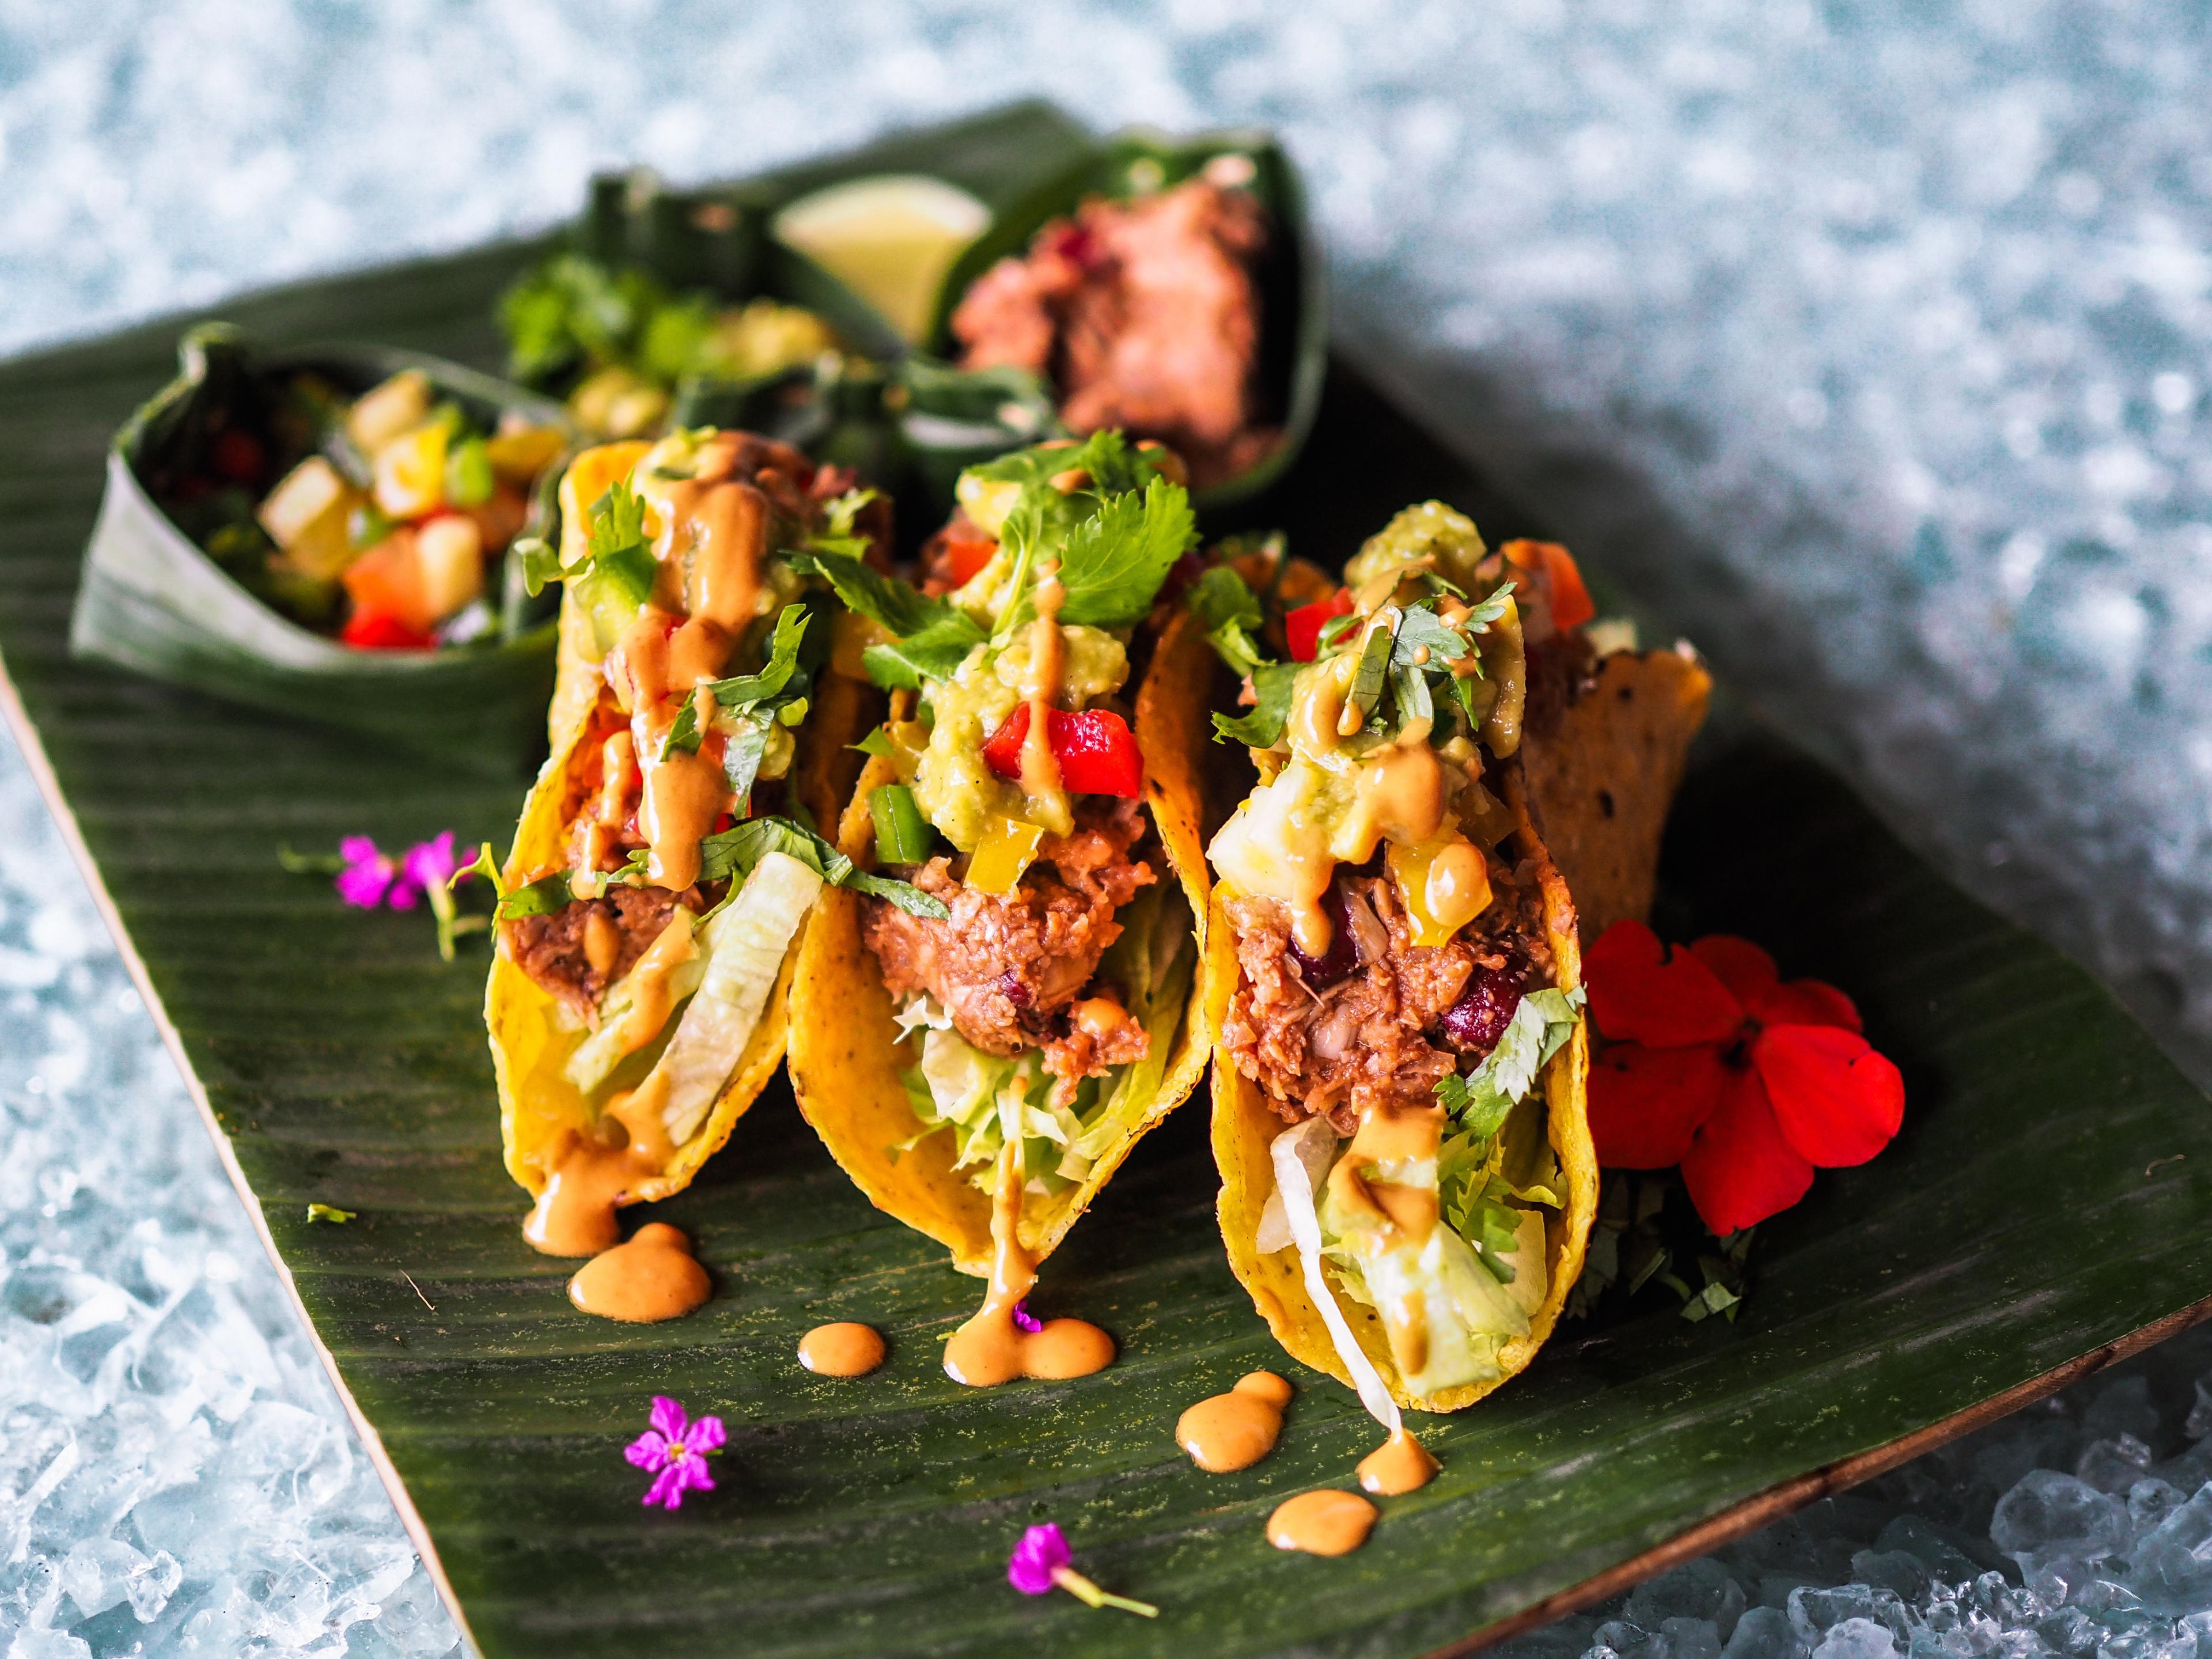 Jackfruit taco